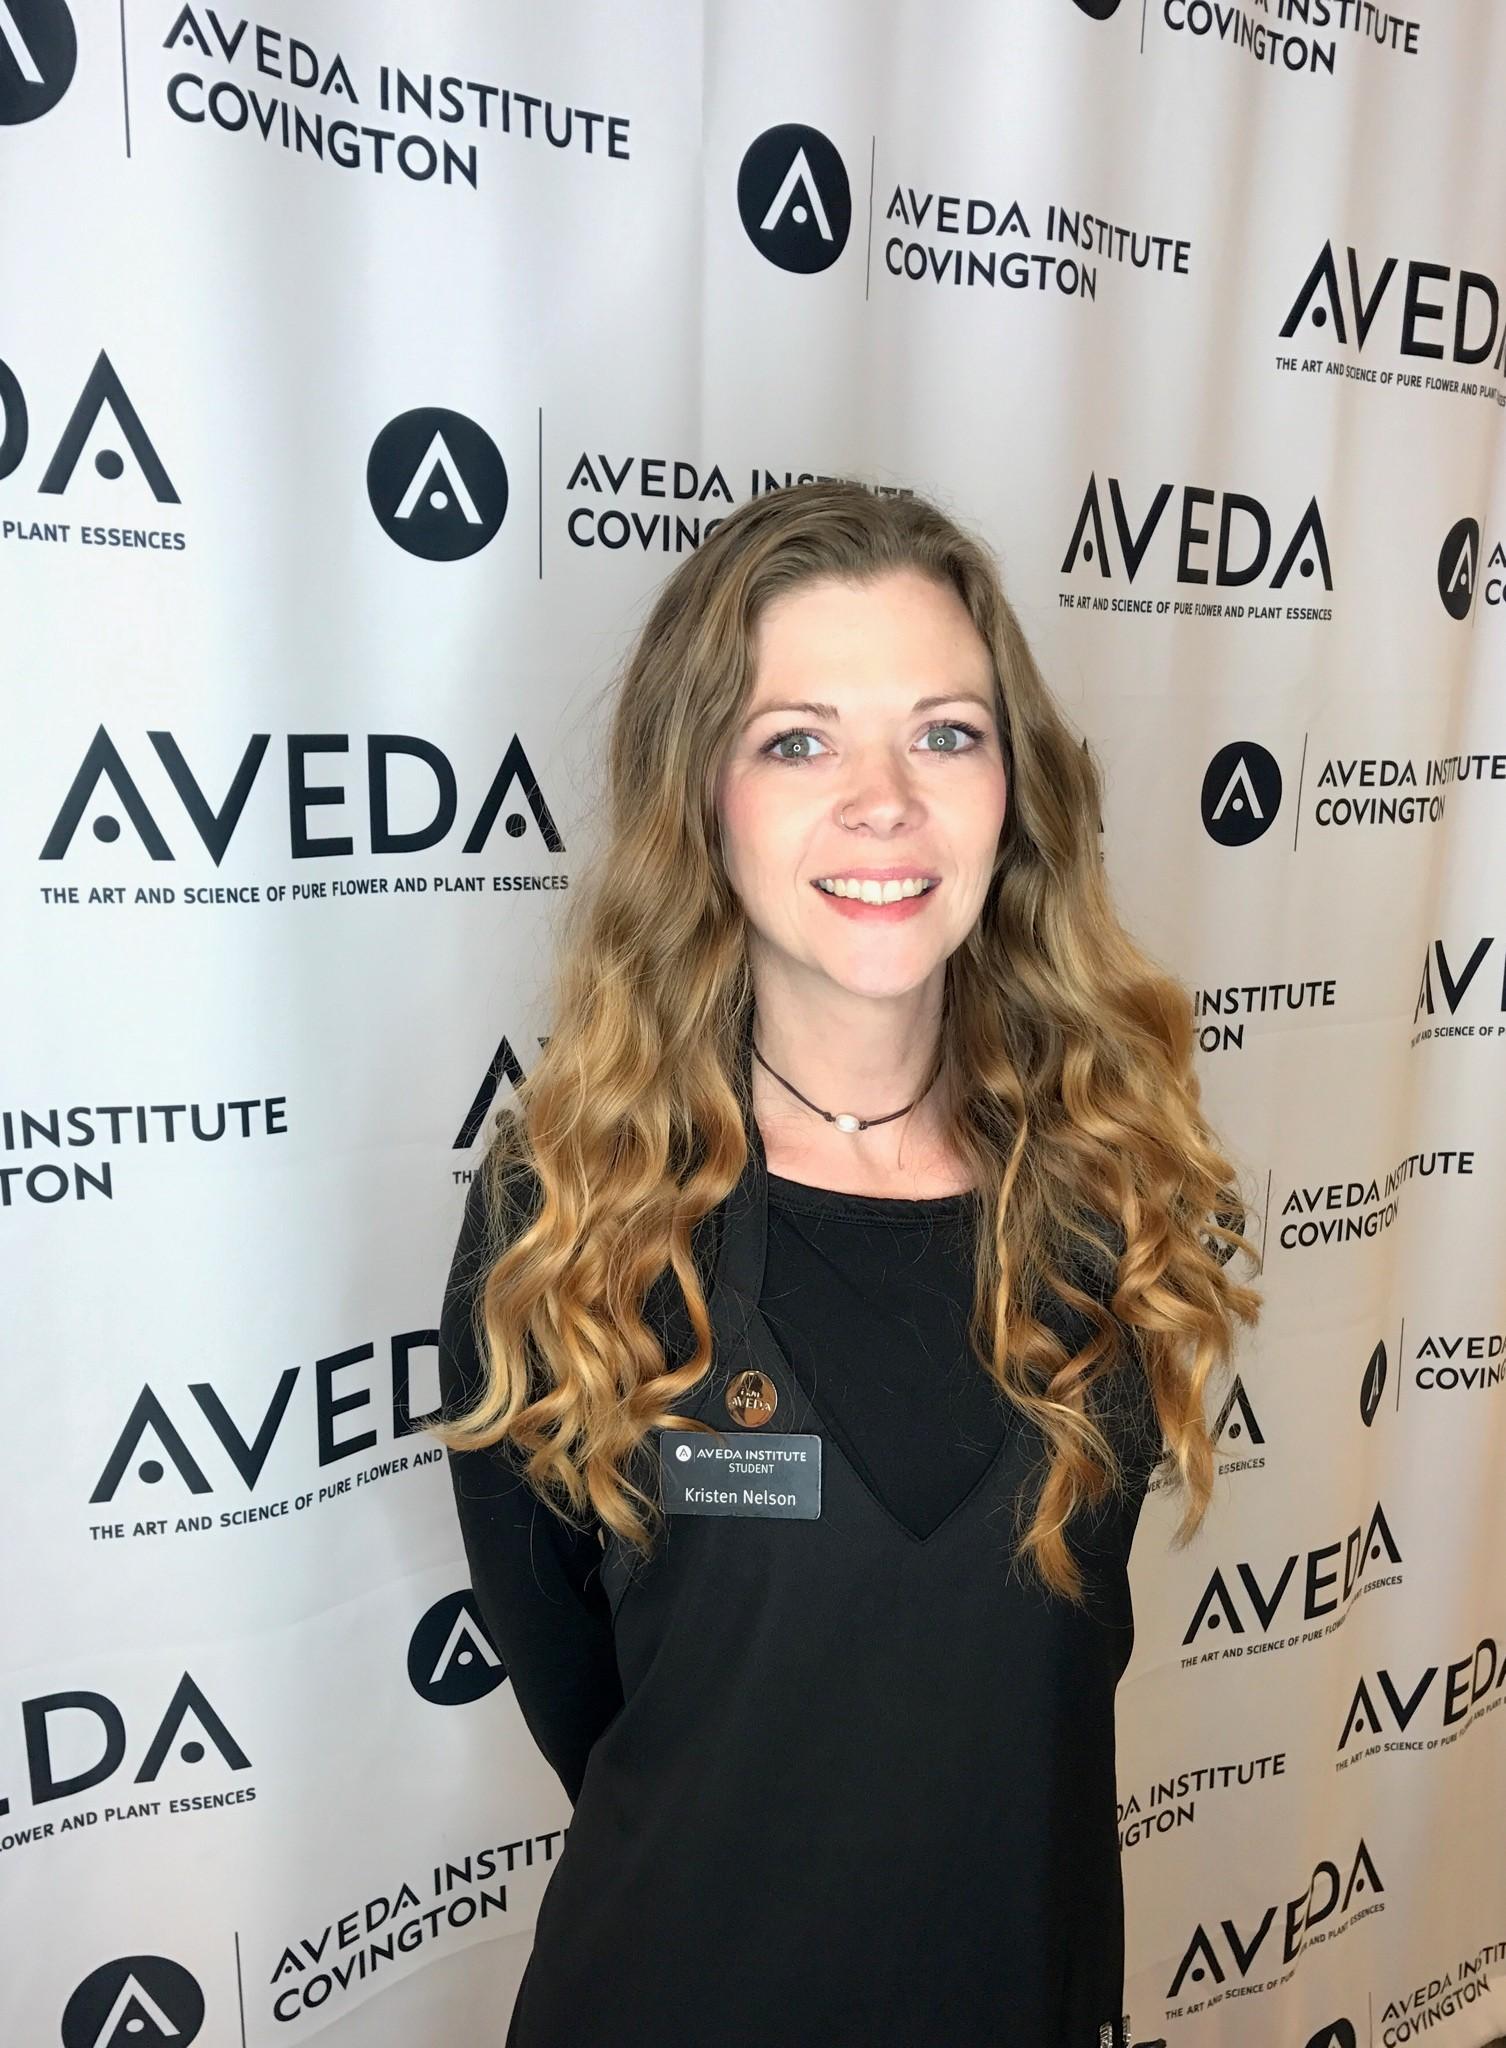 Aveda Covington Student